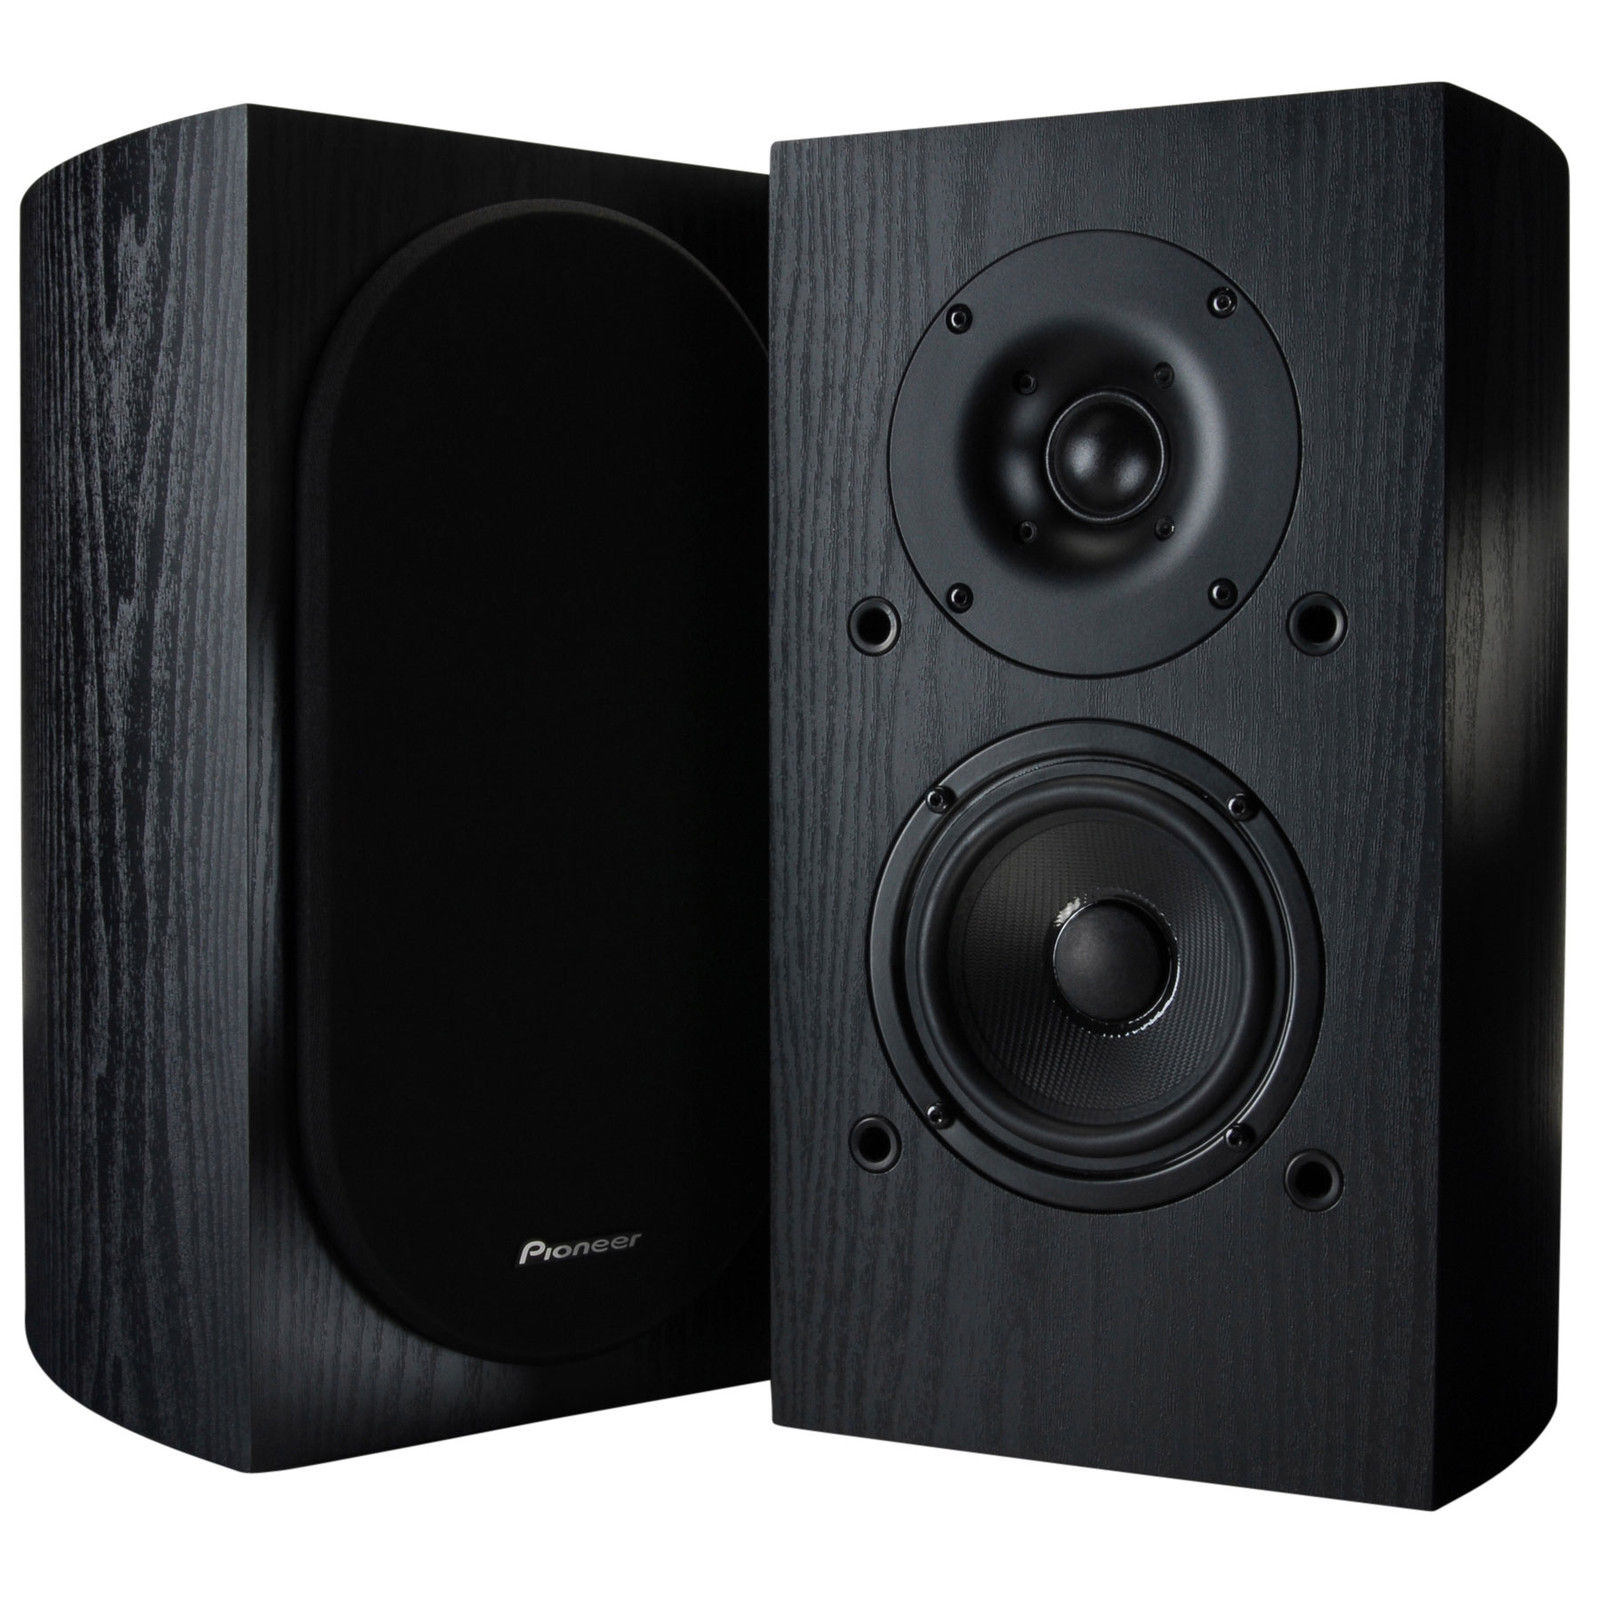 Pioneer SP-BS22 Andrew Jones Designed Bookshelf Speaker, DxWXH 8.4 x 7.1 x 12.6 inches